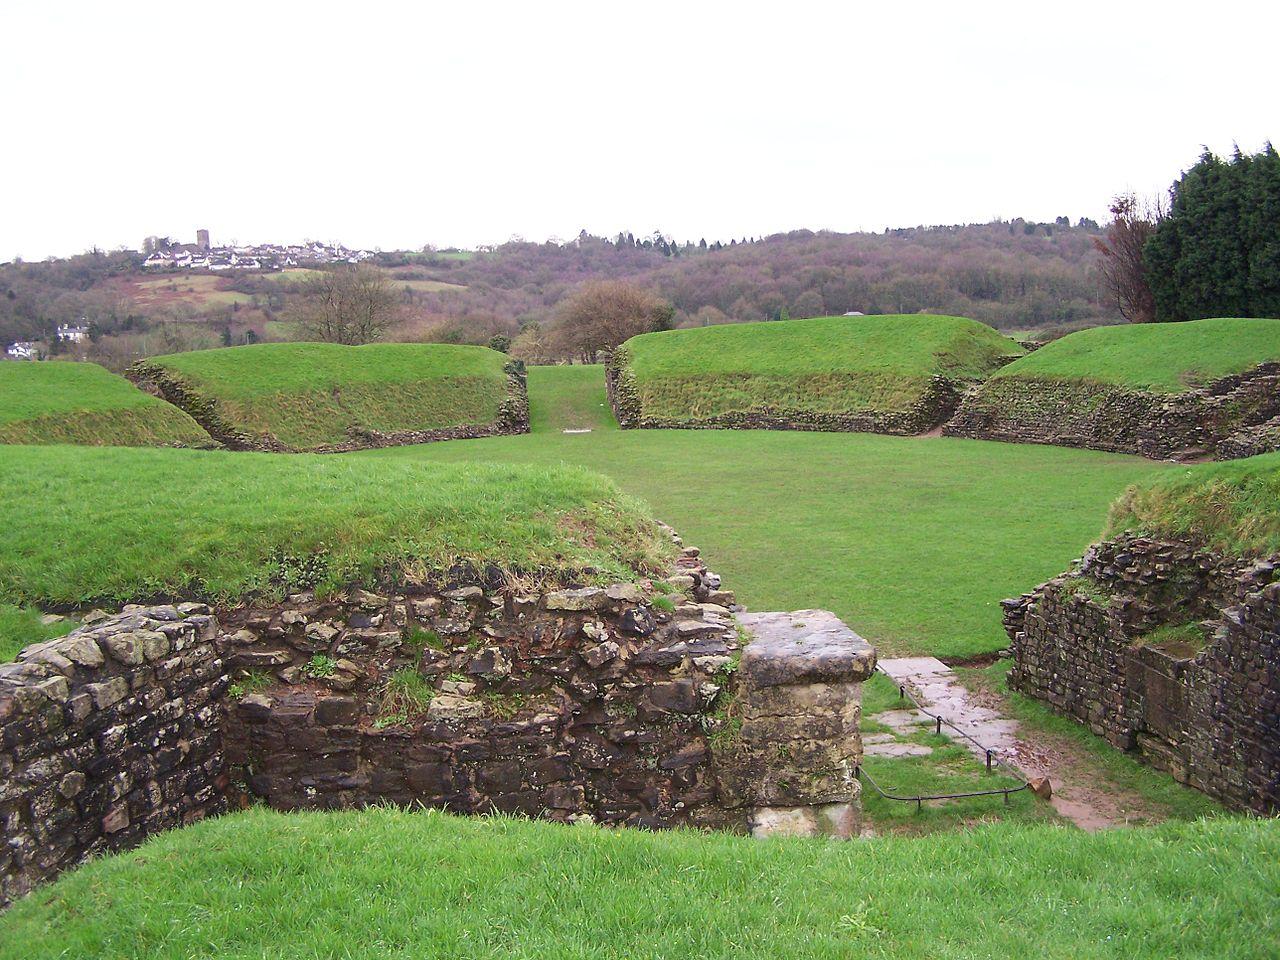 Situl roman Caerleon1